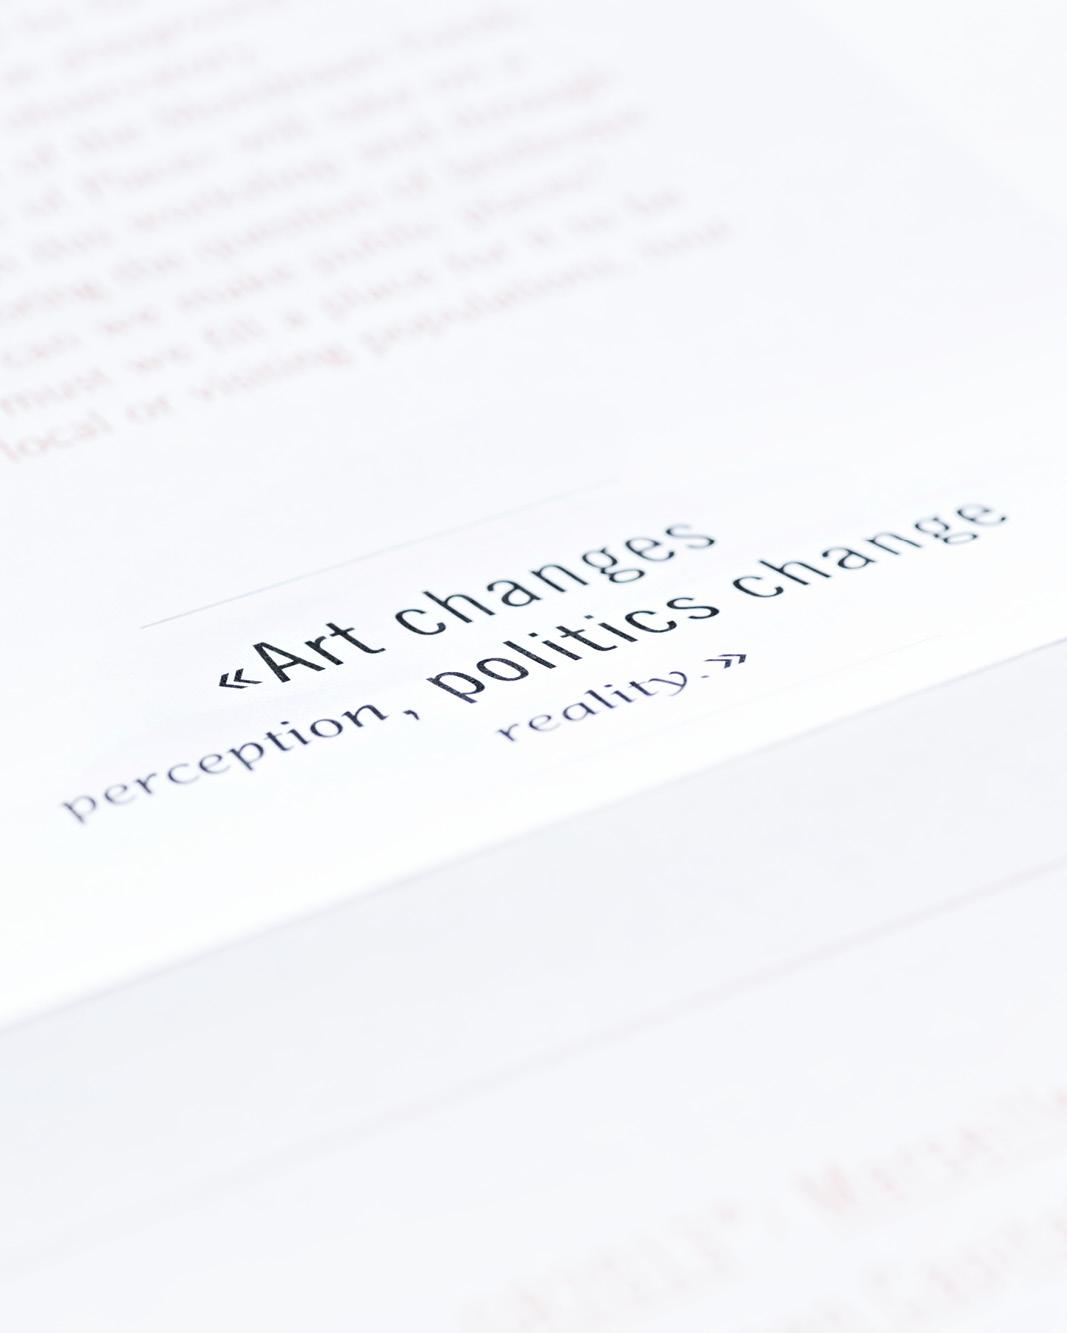 Bureau_Display_Identity_Graphic_Design_Grafik_Visual_Communication_Lucerne_Zurich_European_Streetart_Workshop_Thumb